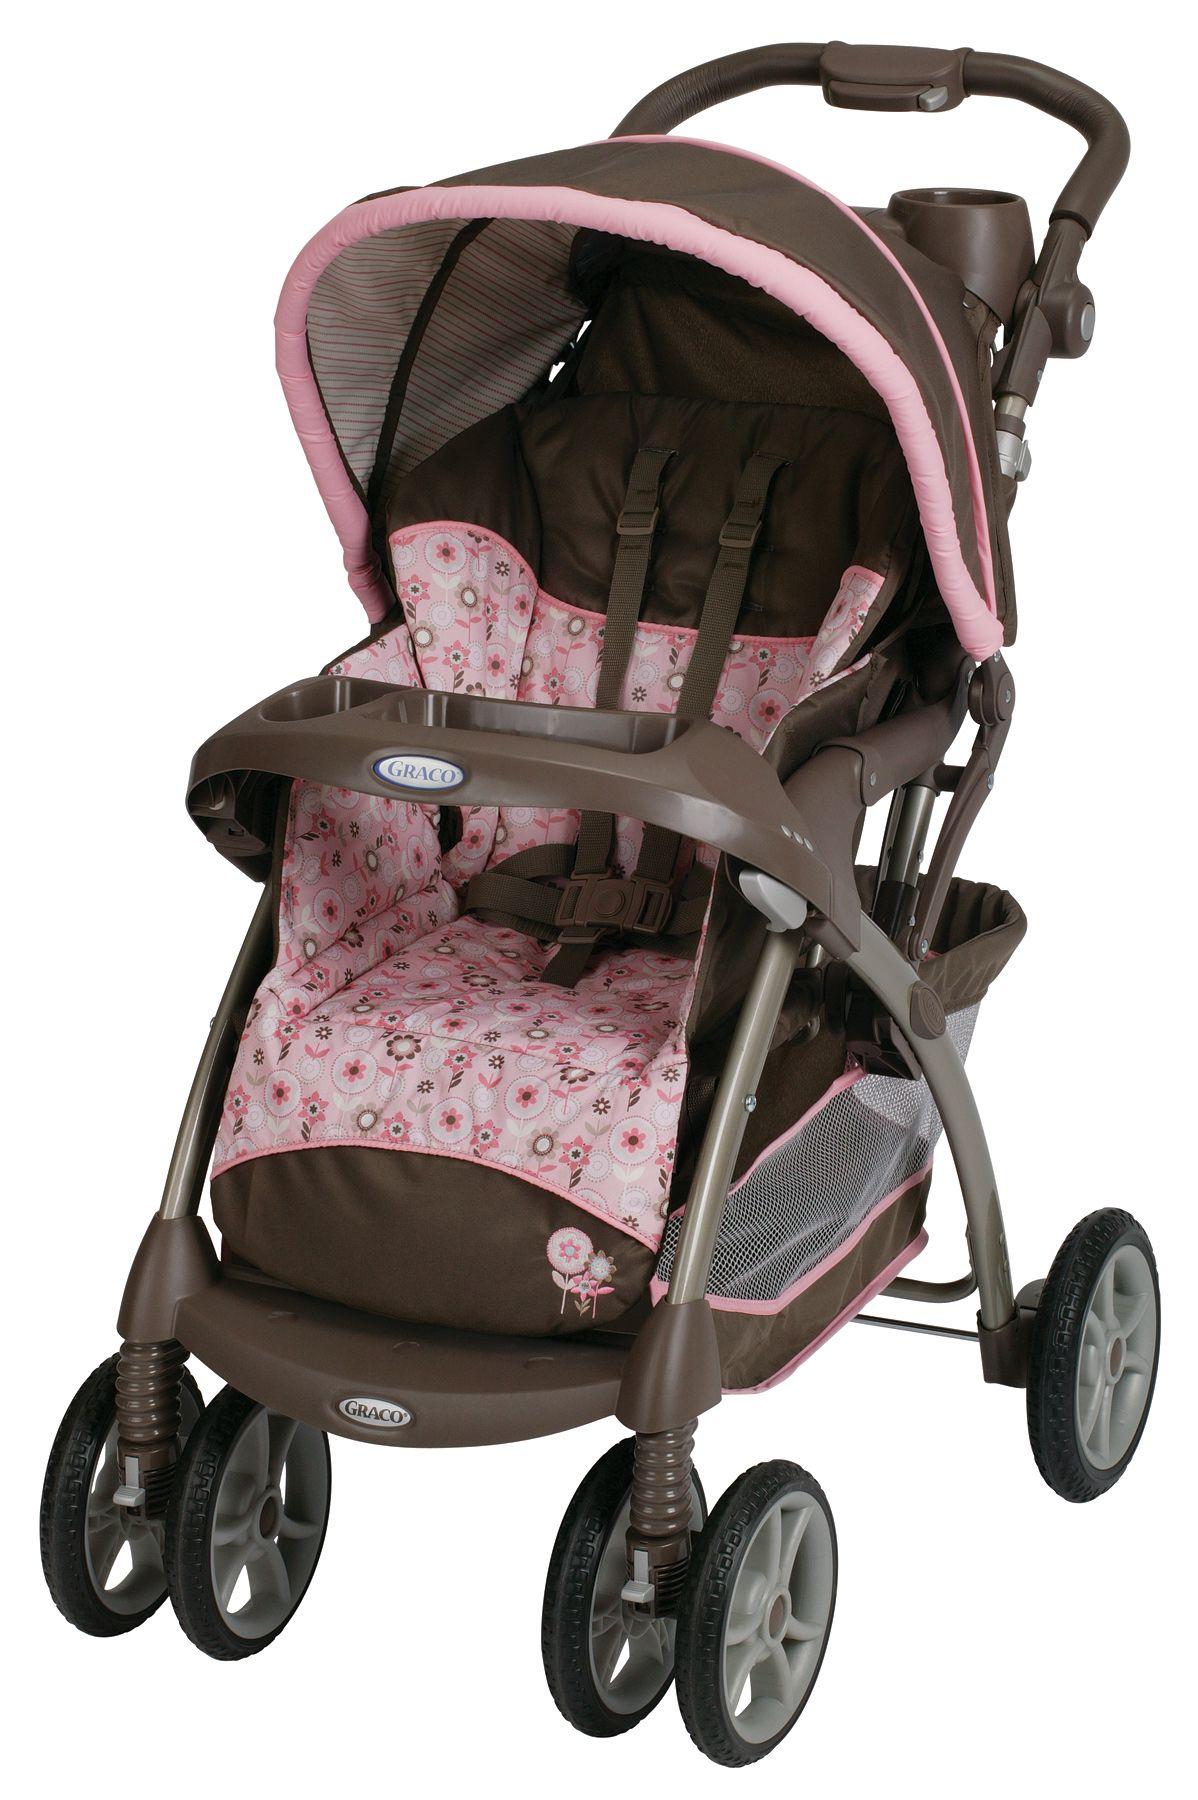 Strollers Stroller, Graco stroller, Baby shower registry